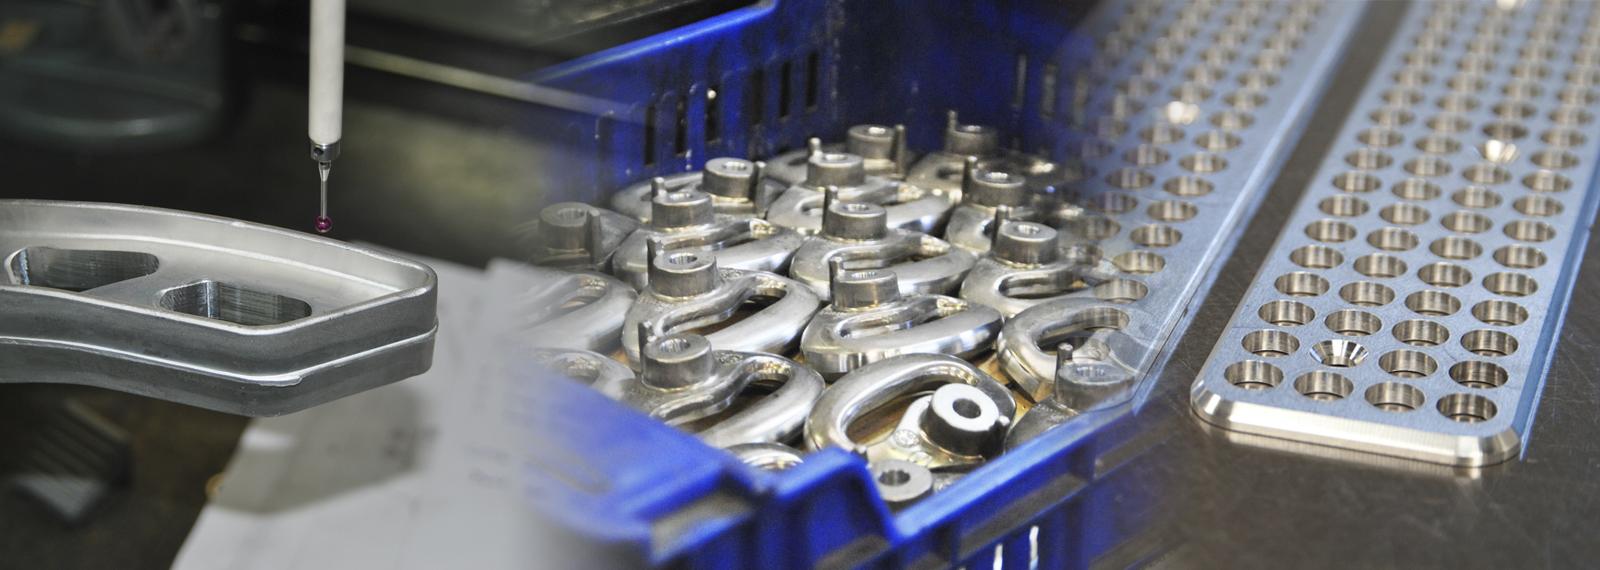 Aleaciones Estampadas S.A. - AESA Forging and machining lightweight alloys